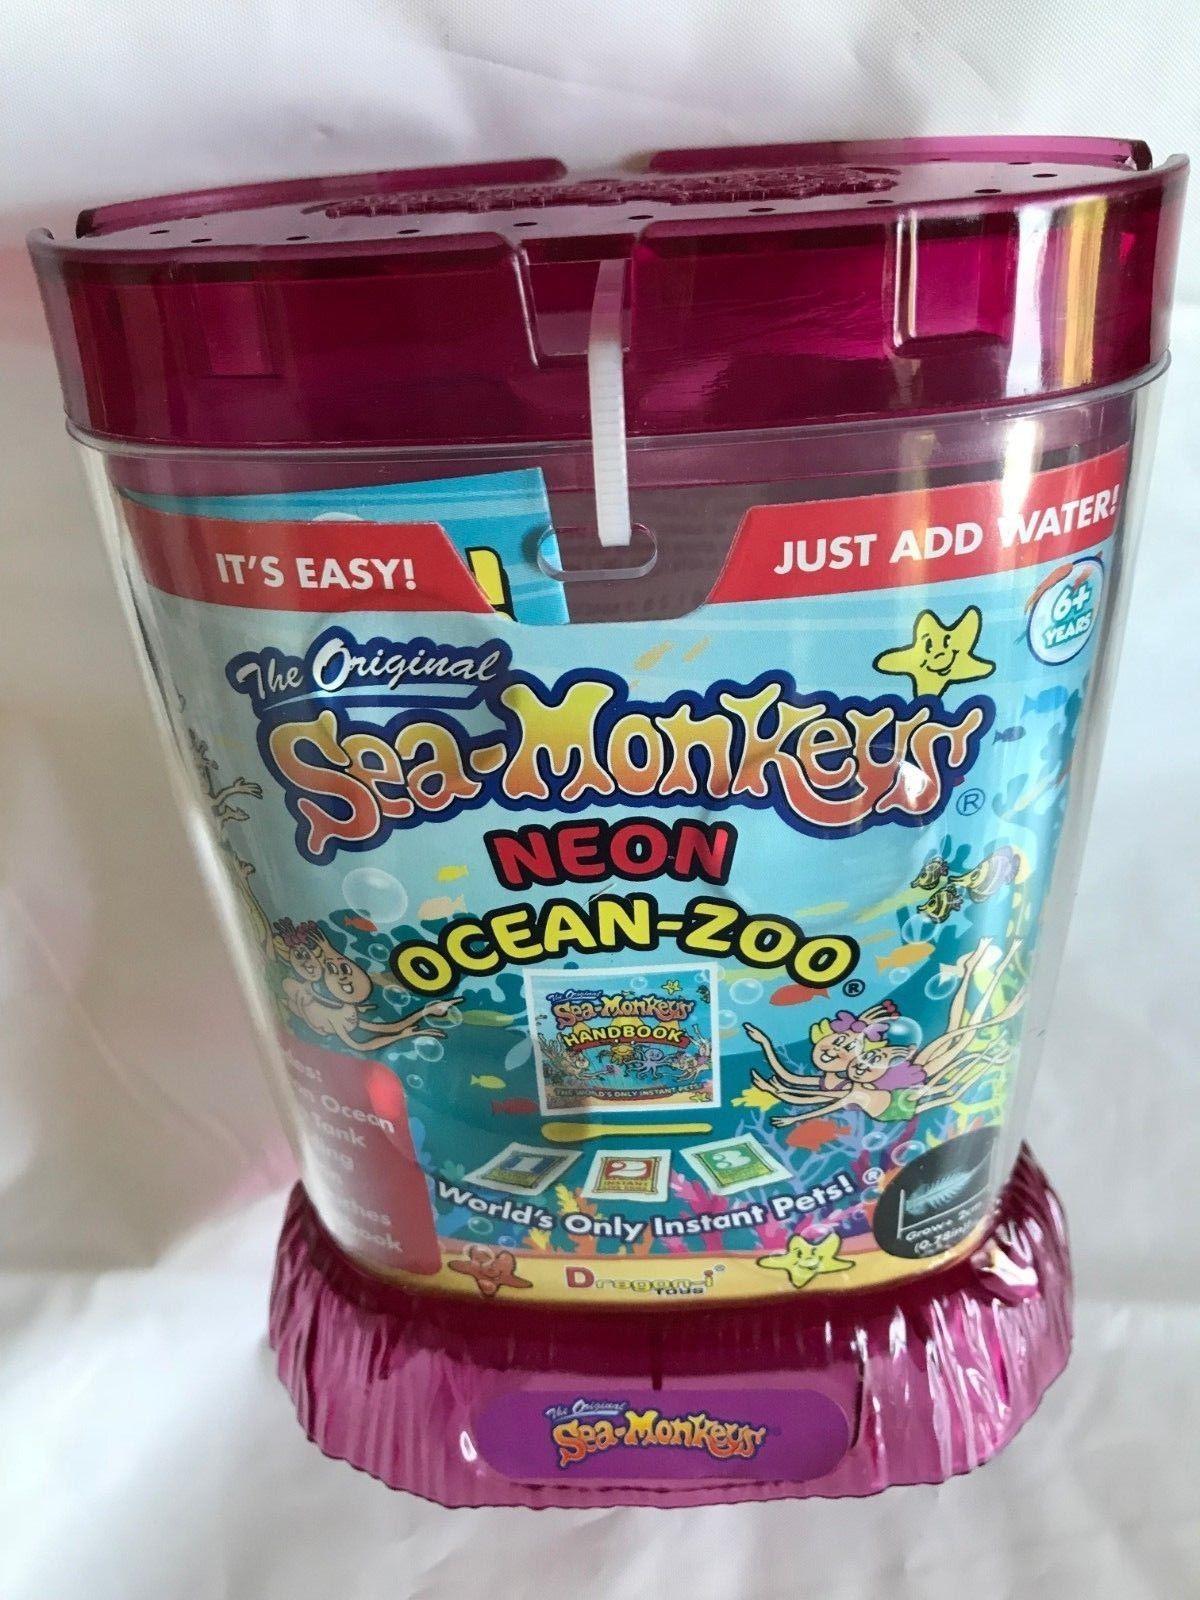 Amazing Live Sea Monkeys Ocean Zoo Marine Aquarium Neon Pink 23232 Sea Monkeys Marine Aquarium Zoo Toys